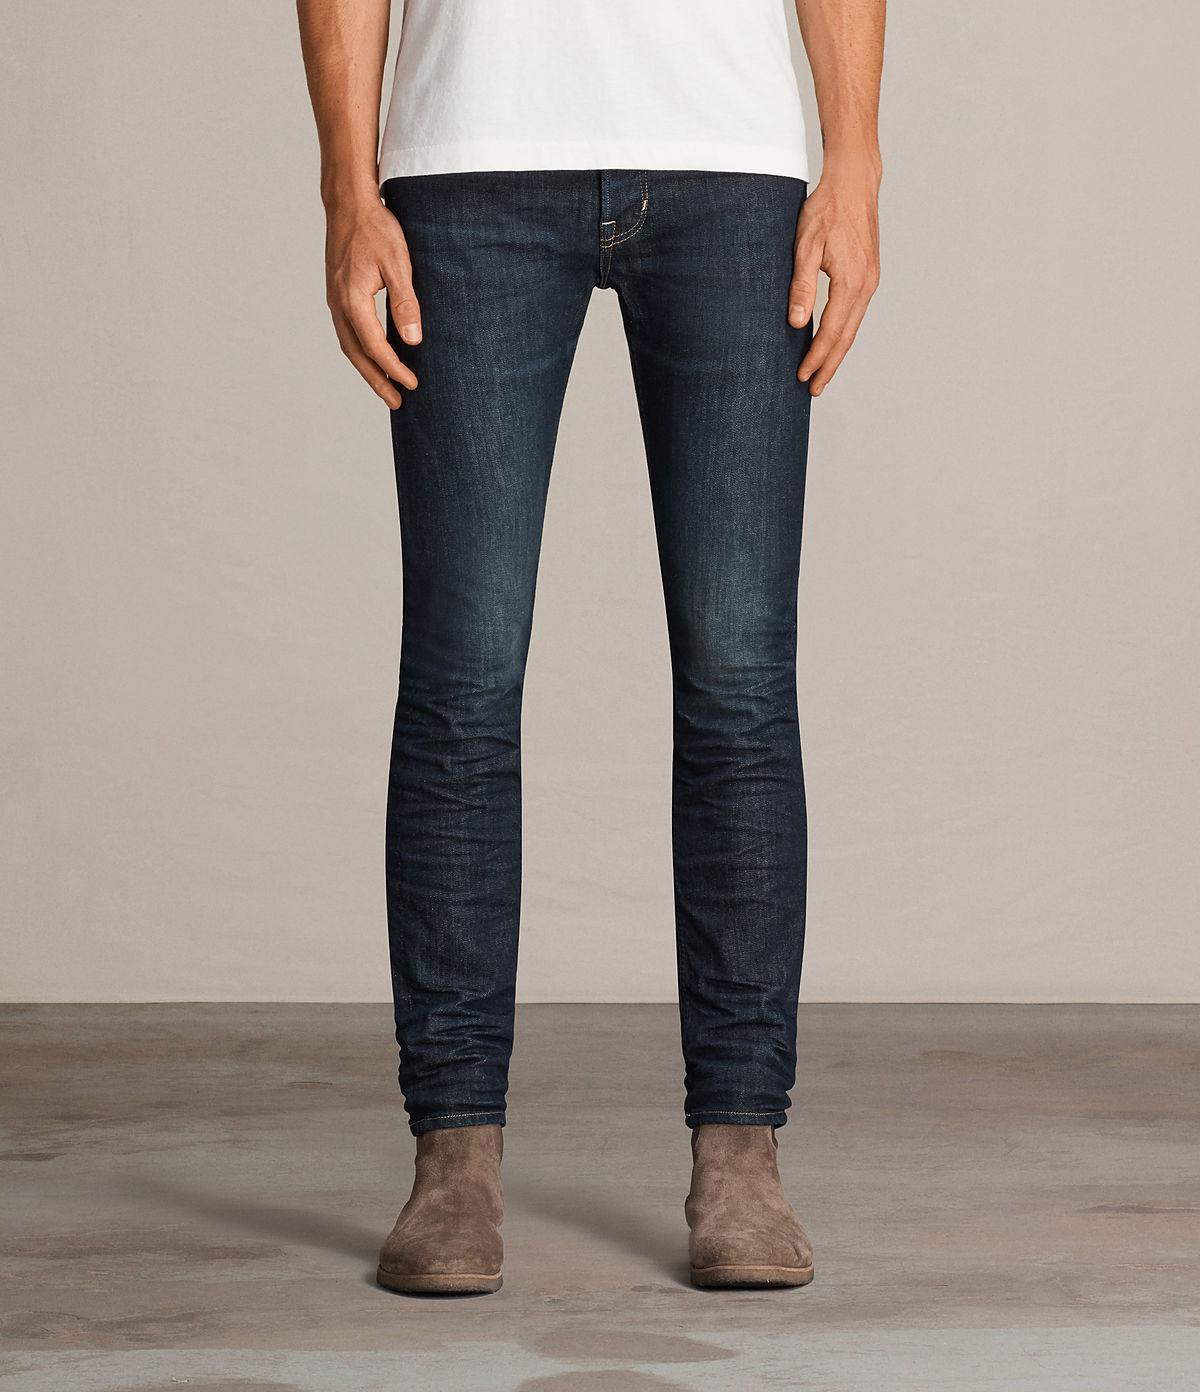 inagawa-cigarette-jeans